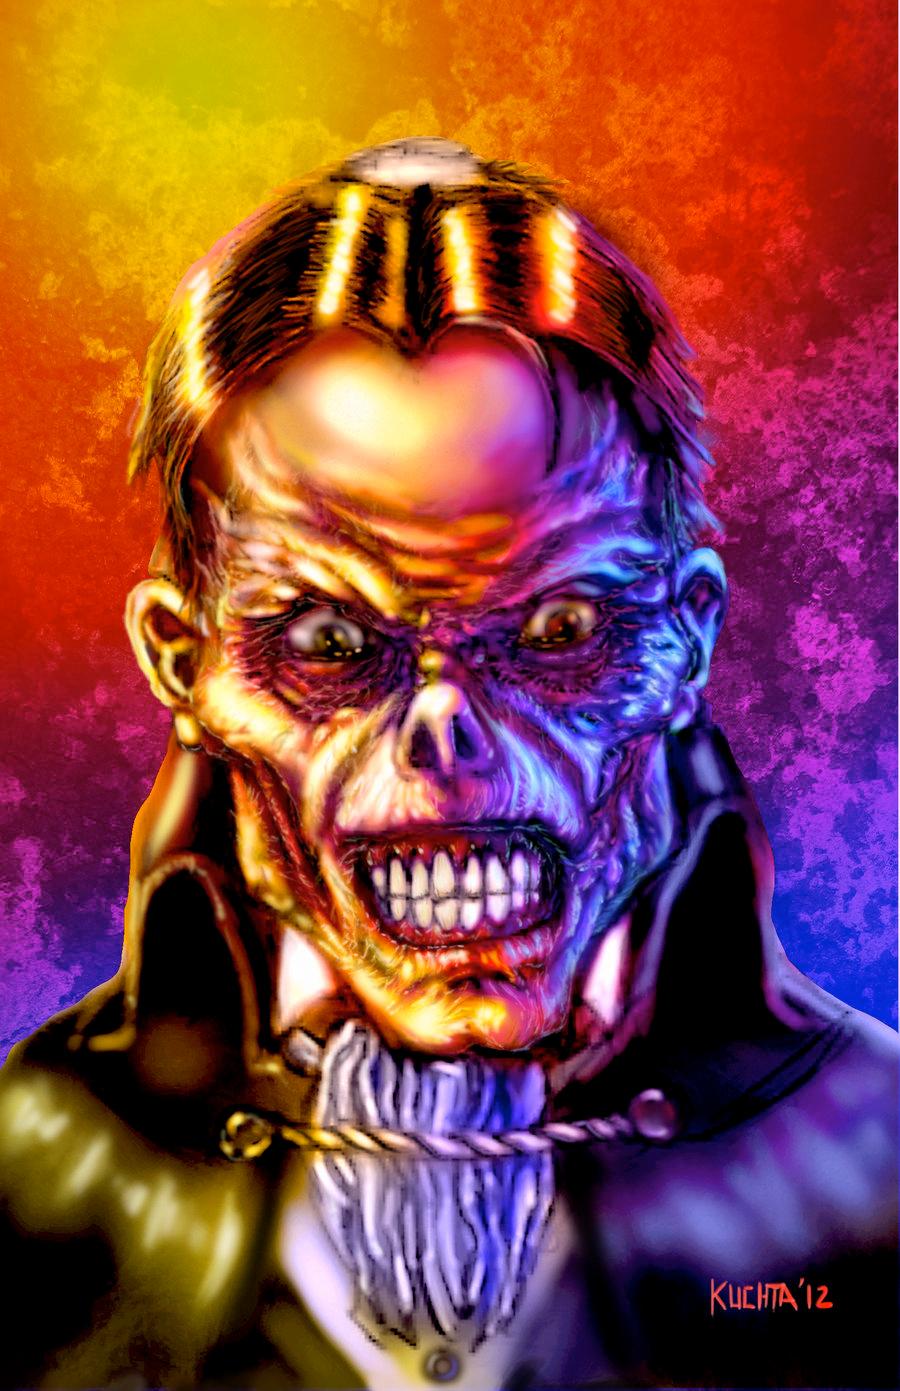 Chris Kuchta - The Phantom of the Opera